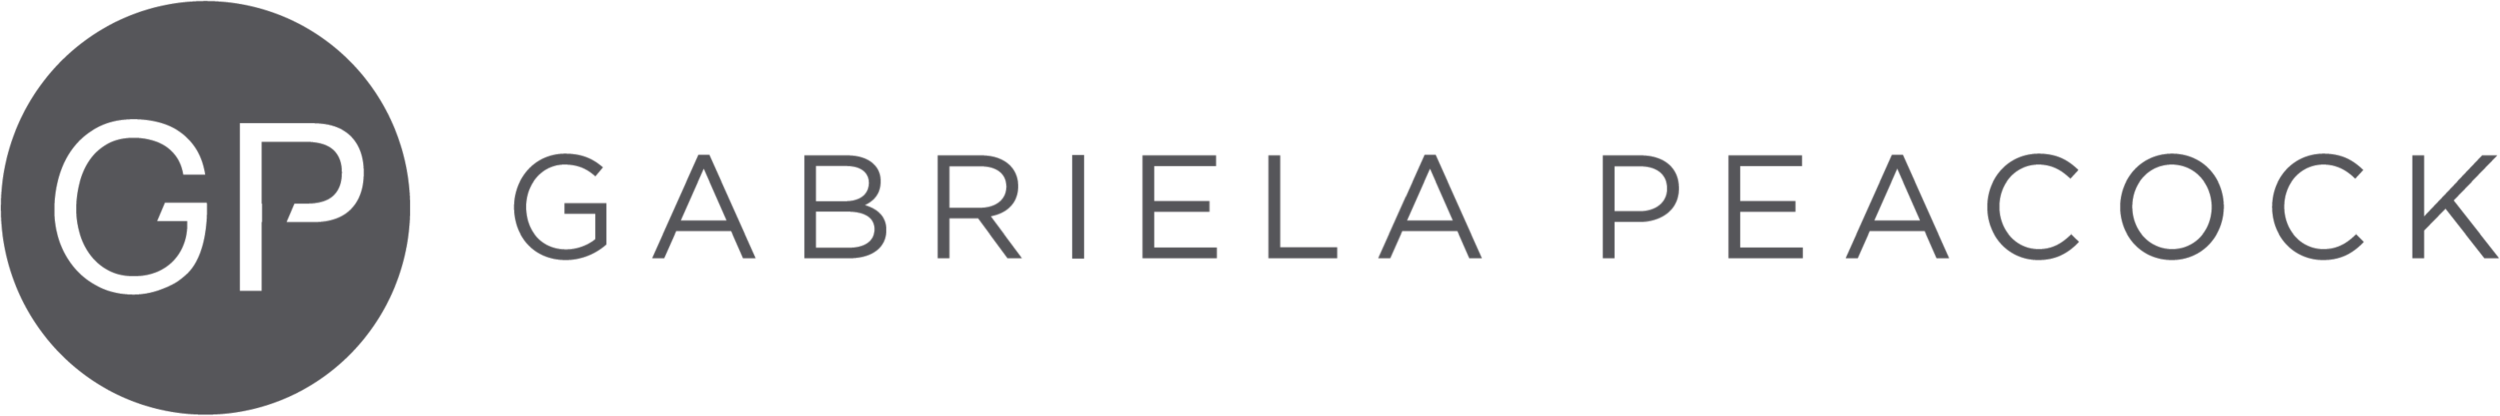 trans-logo-black.png